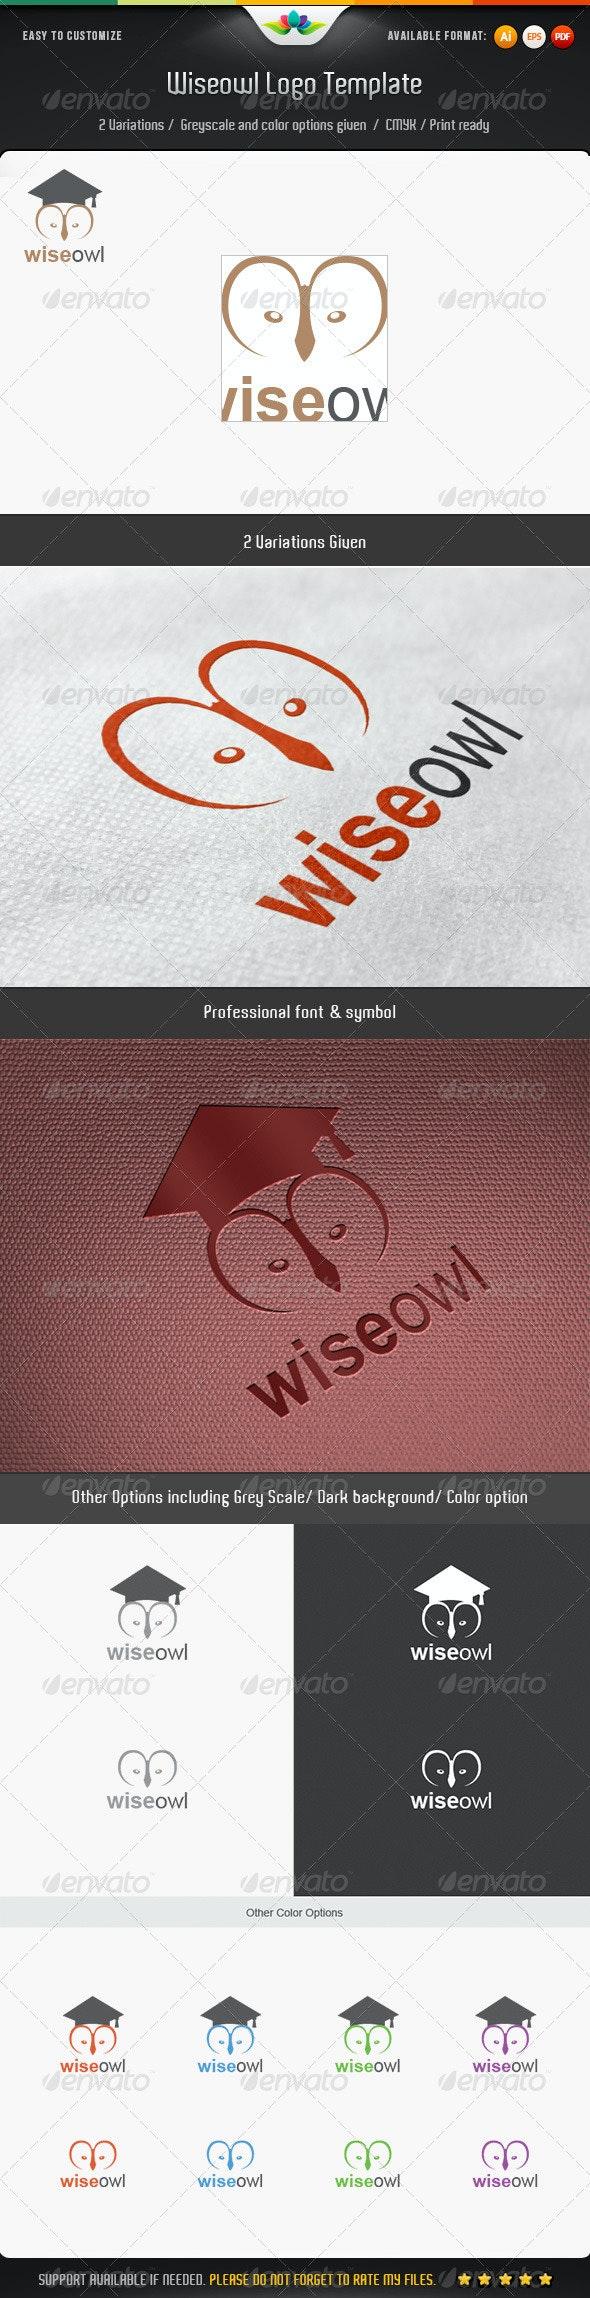 Wiseowl Logo Template - Animals Logo Templates